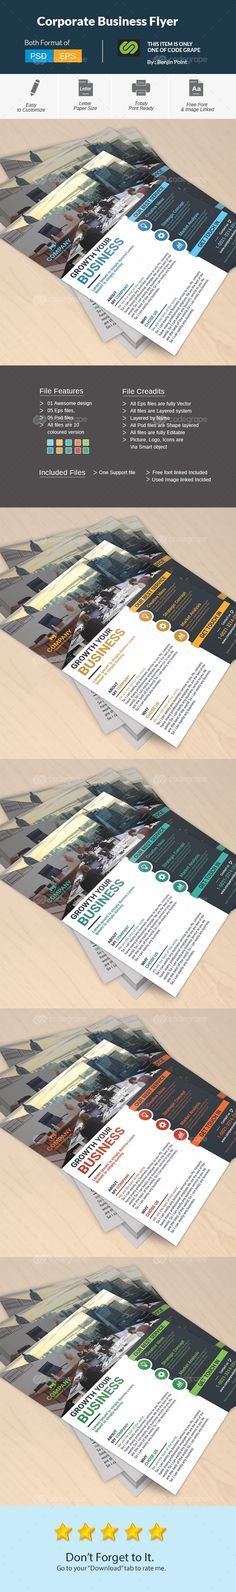 Corporate Business Flyer - https://www.codegrape.com/item/corporate-business-flyer/8032